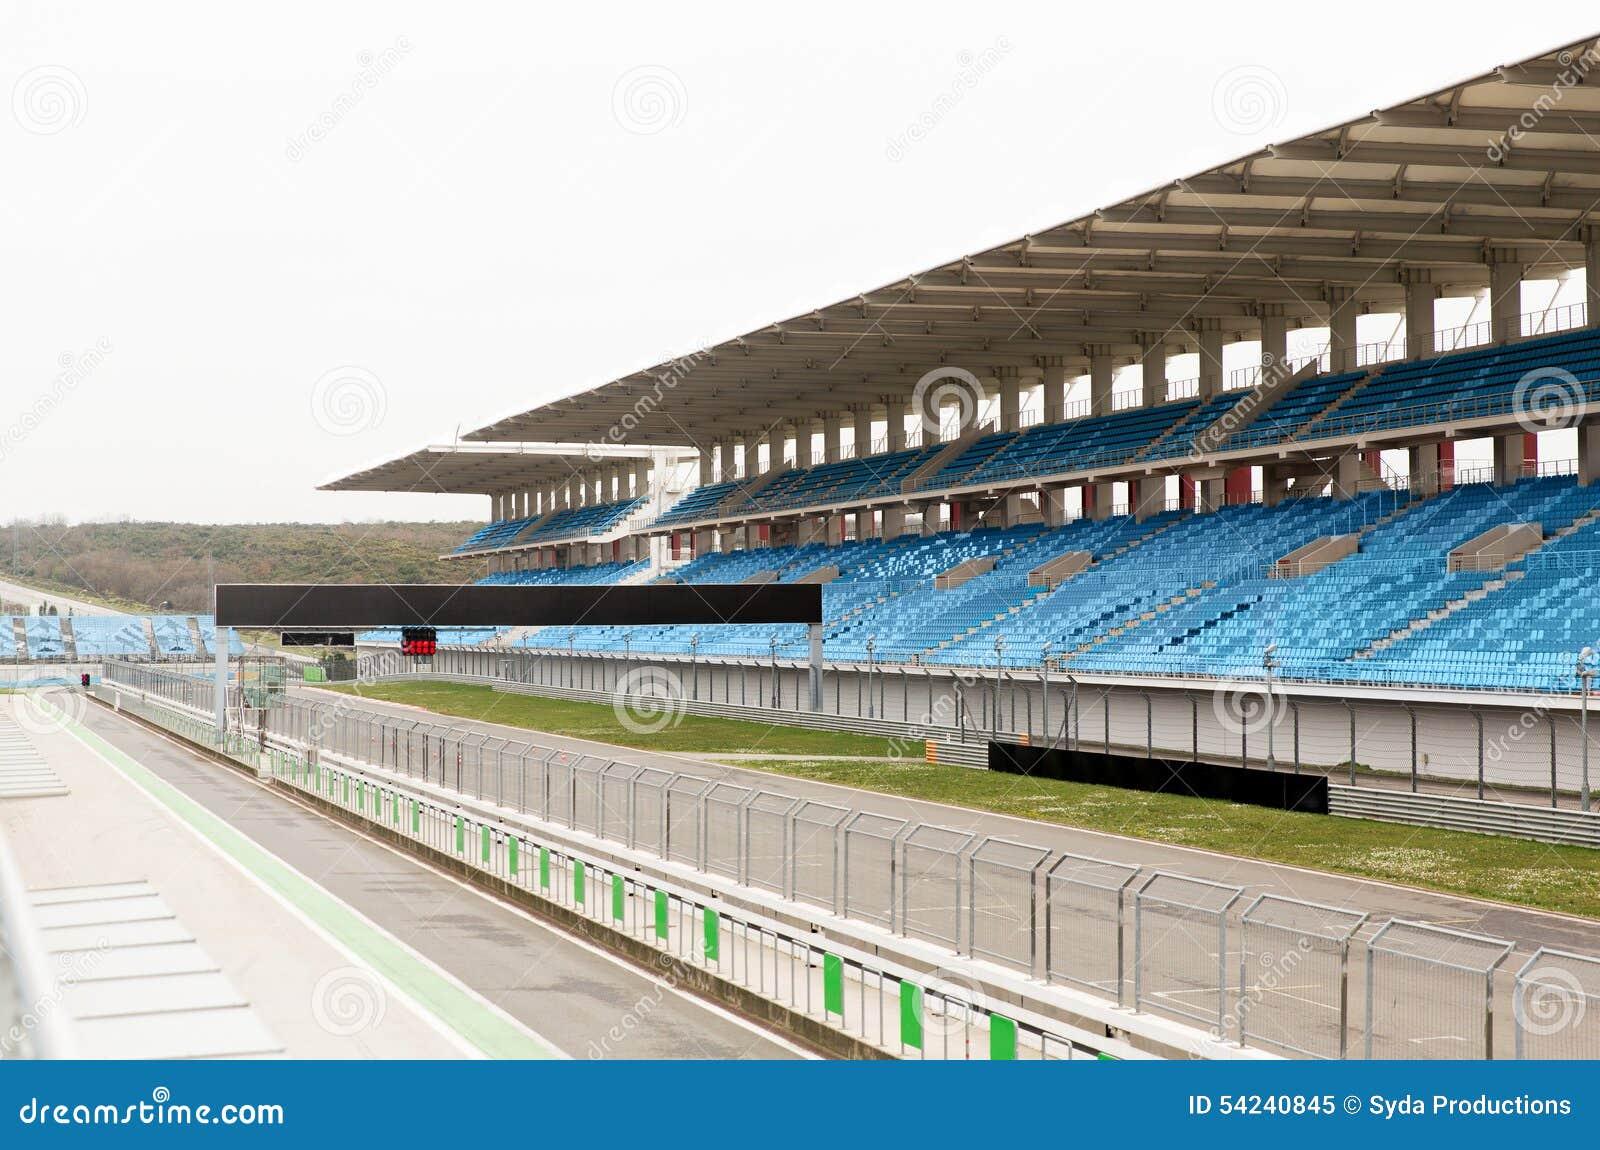 Empty Speedway And Bleachers On Stadium Stock Photo